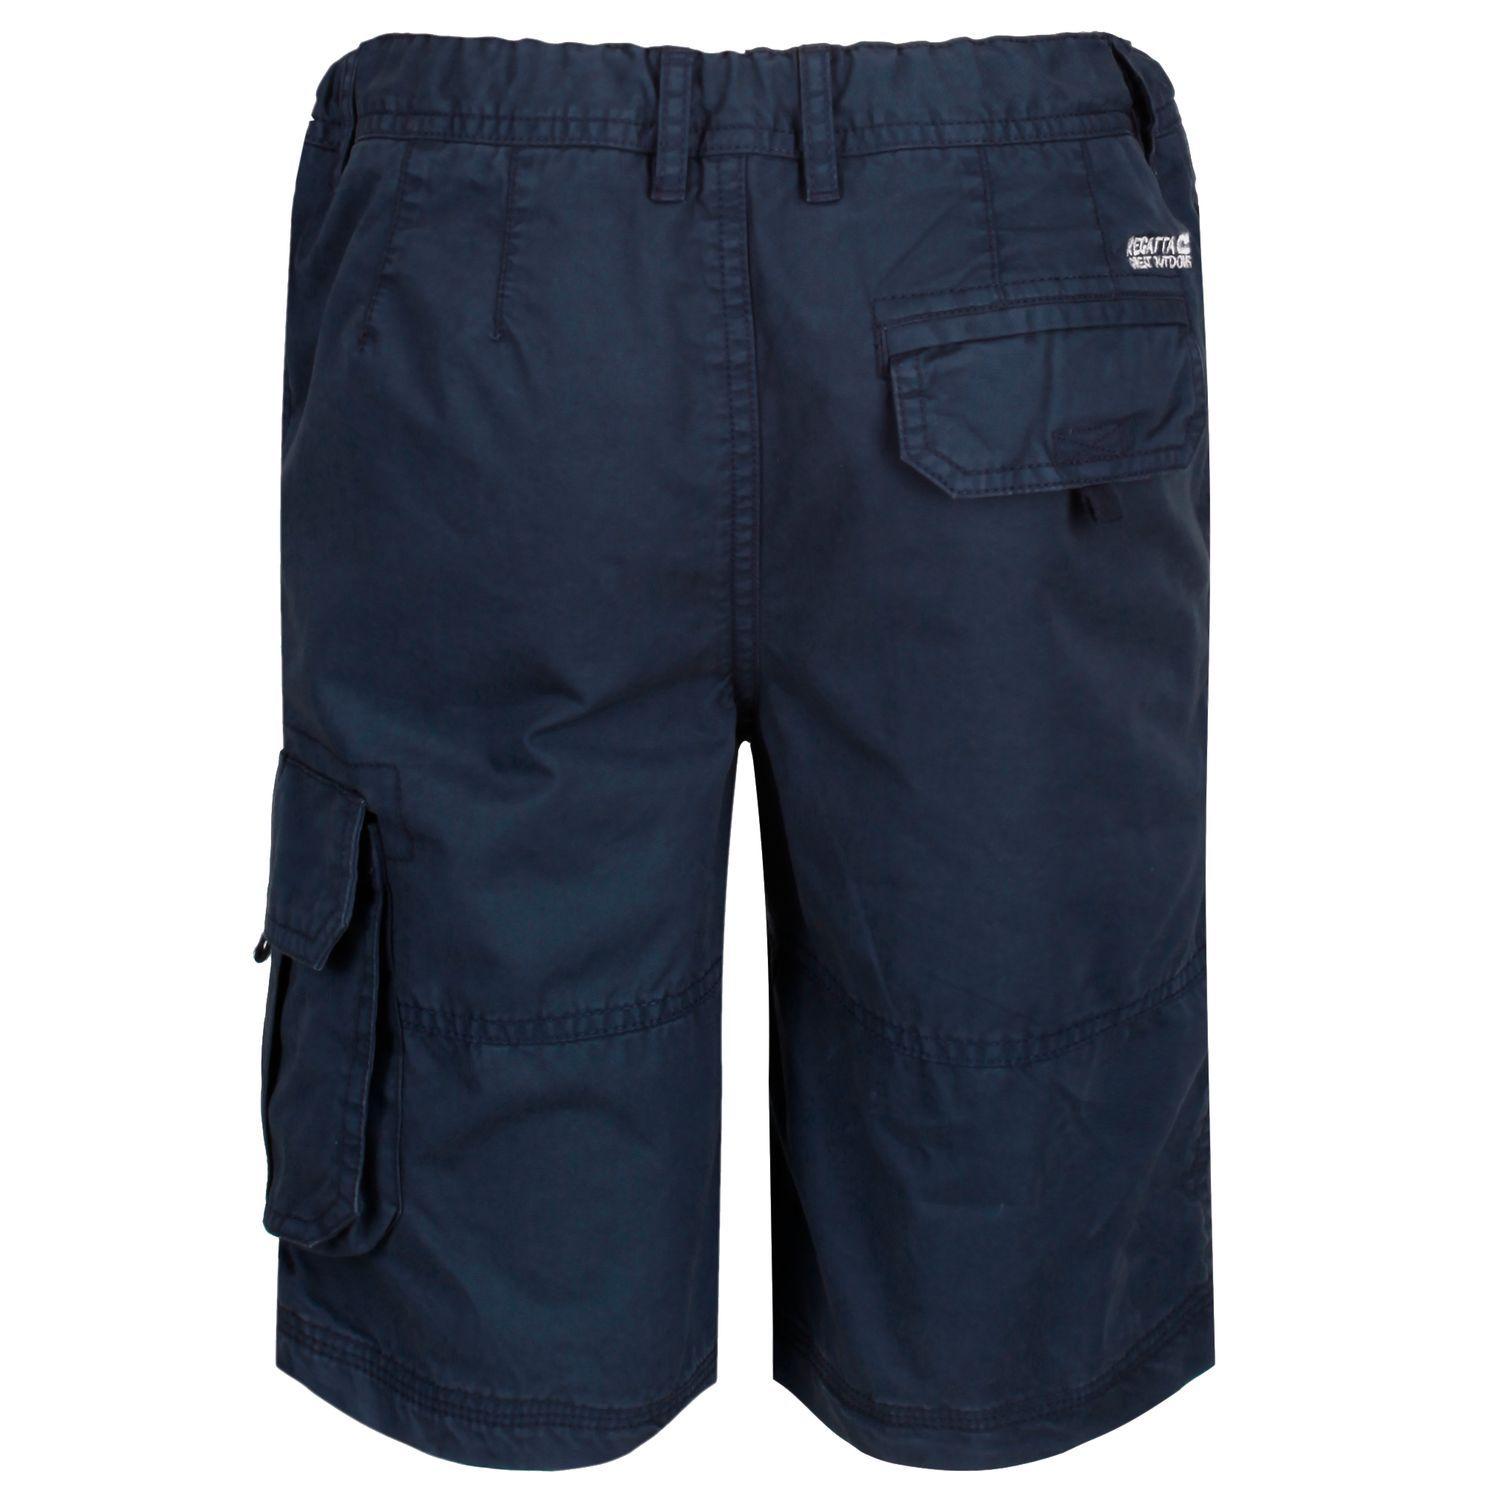 Regatta Kids Shorewalk Multi Pocket Shorts (Navy)